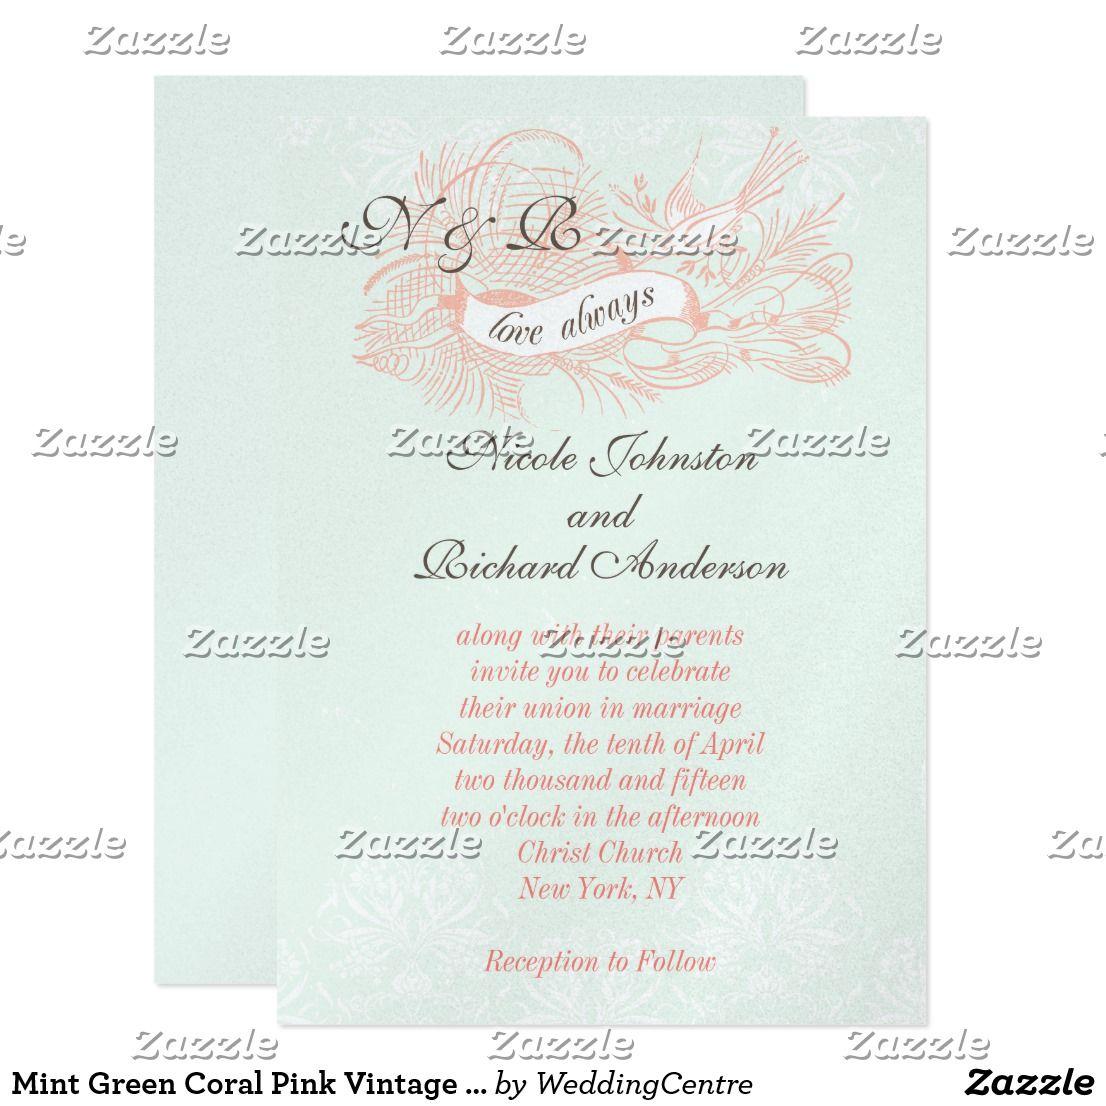 Mint Green Coral Pink Vintage Wedding Invitation | Vintage wedding ...